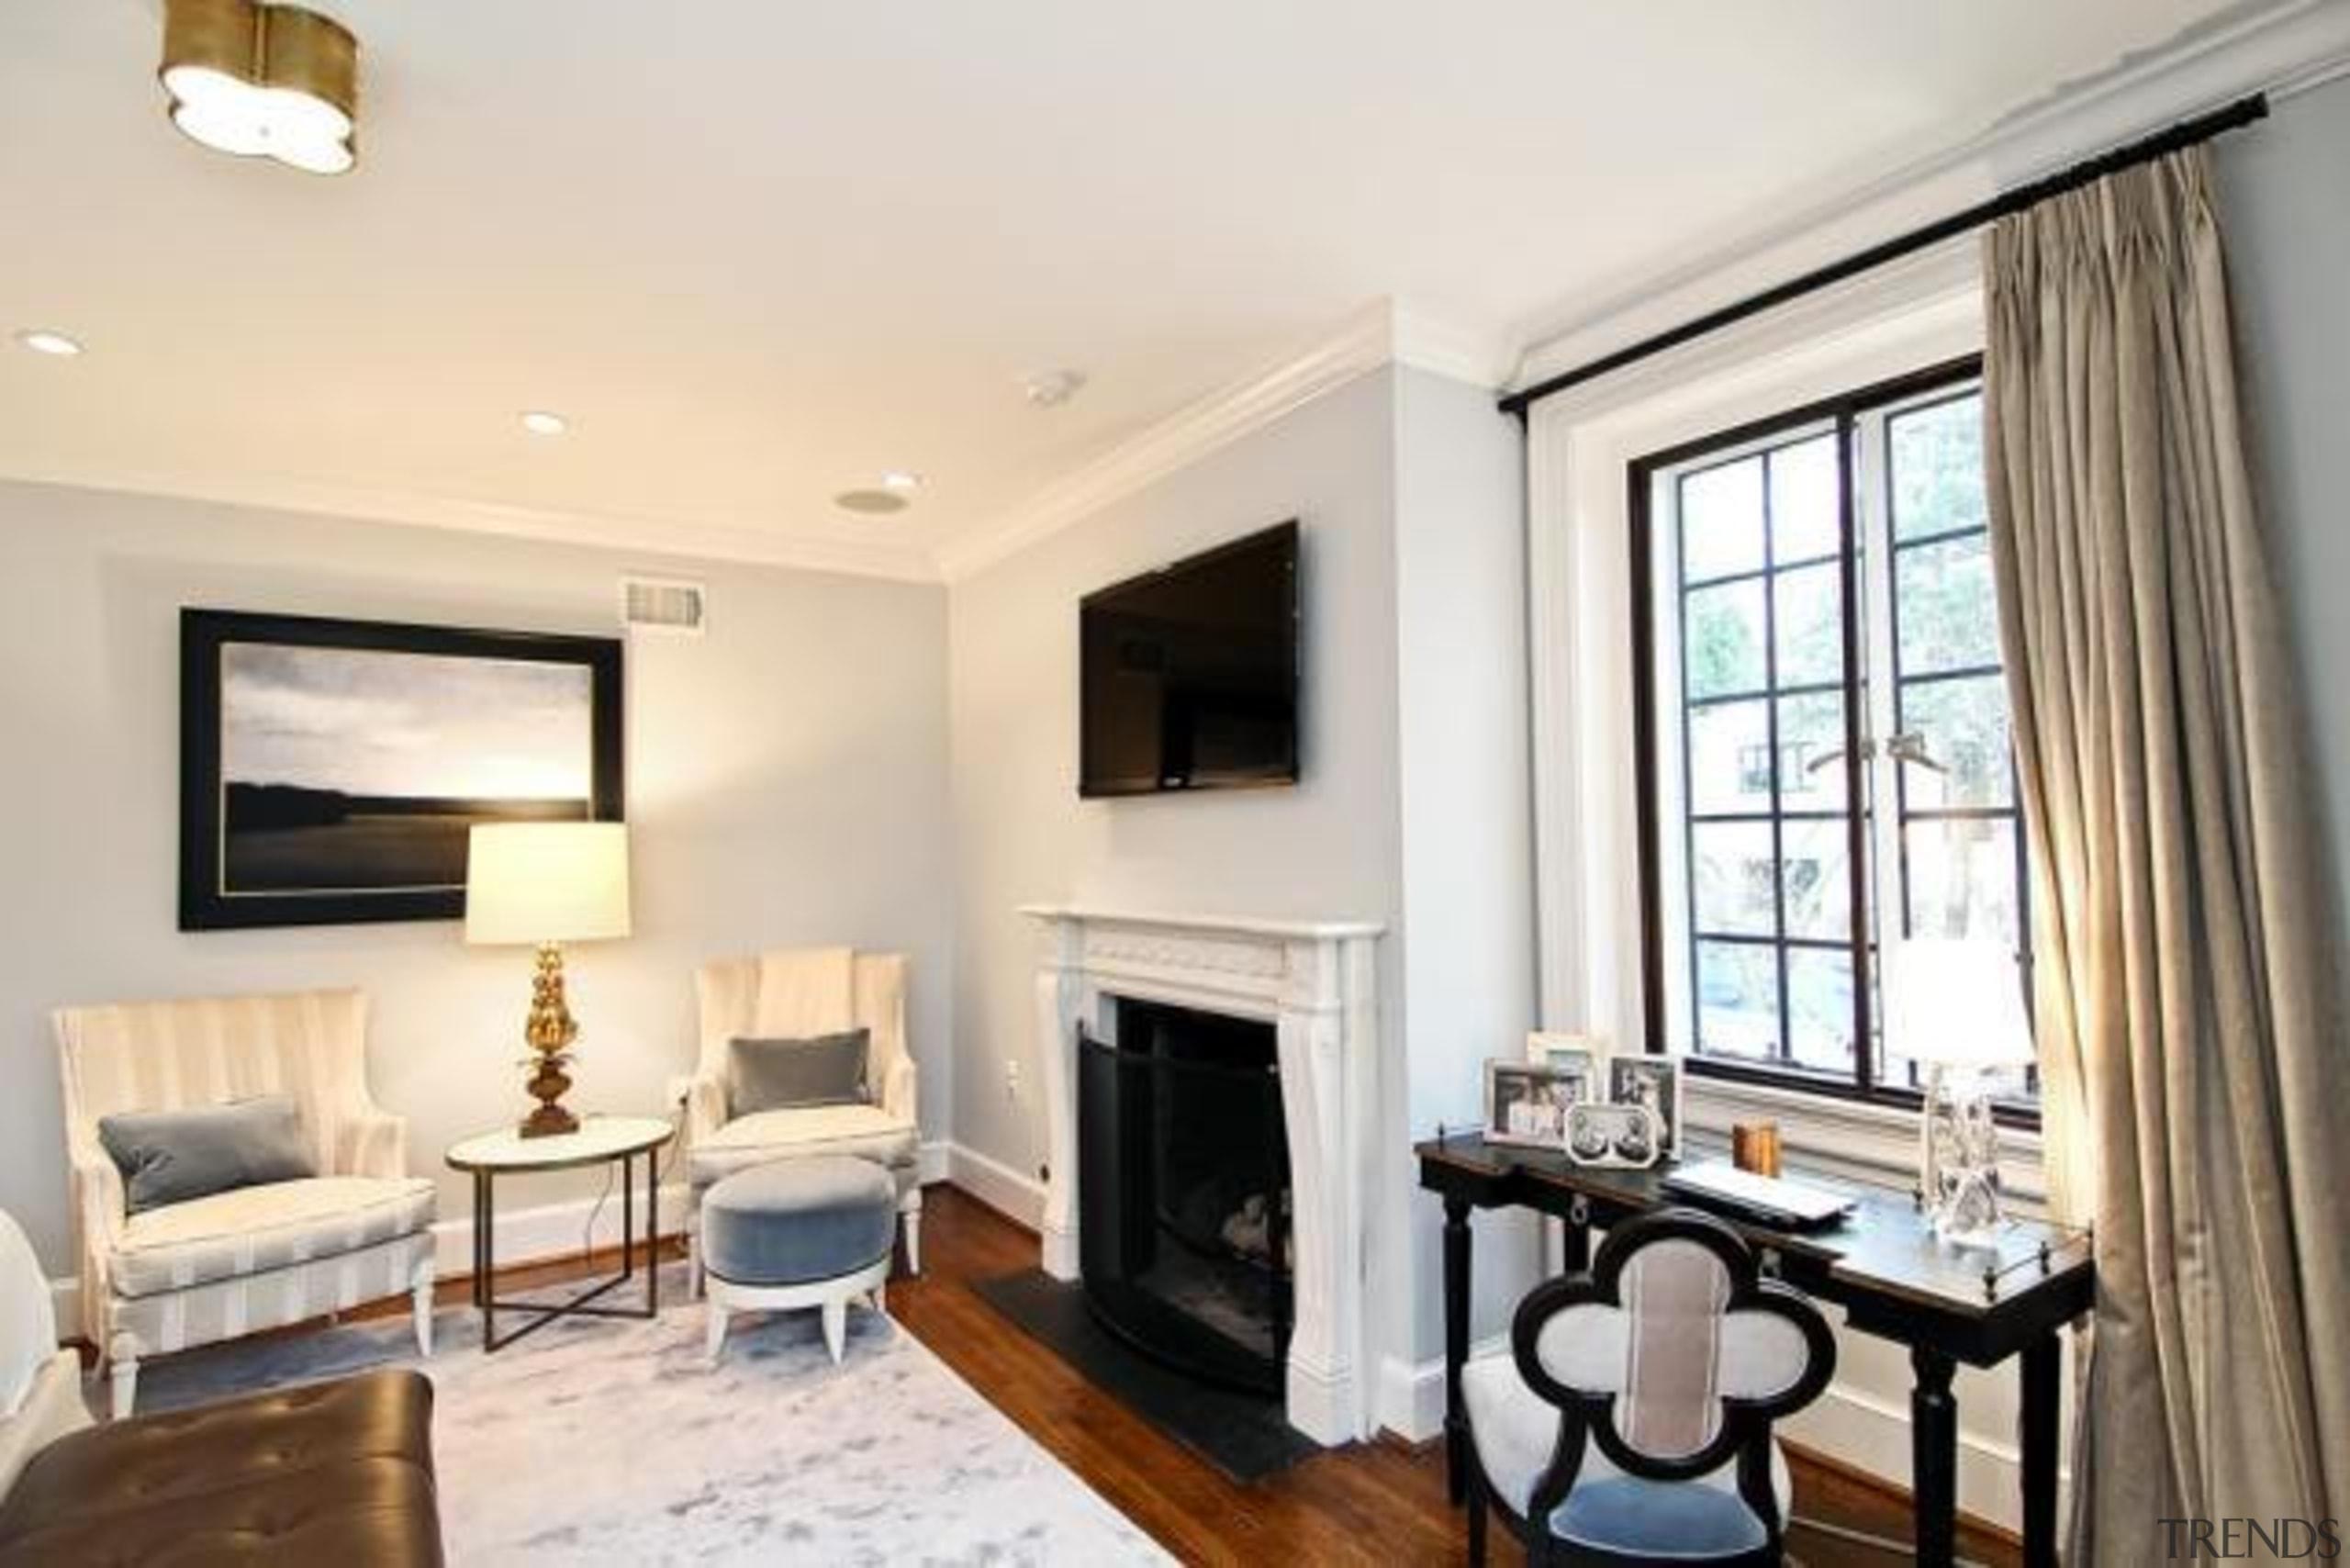 Original story from Trulia home, interior design, living room, property, real estate, room, window, white